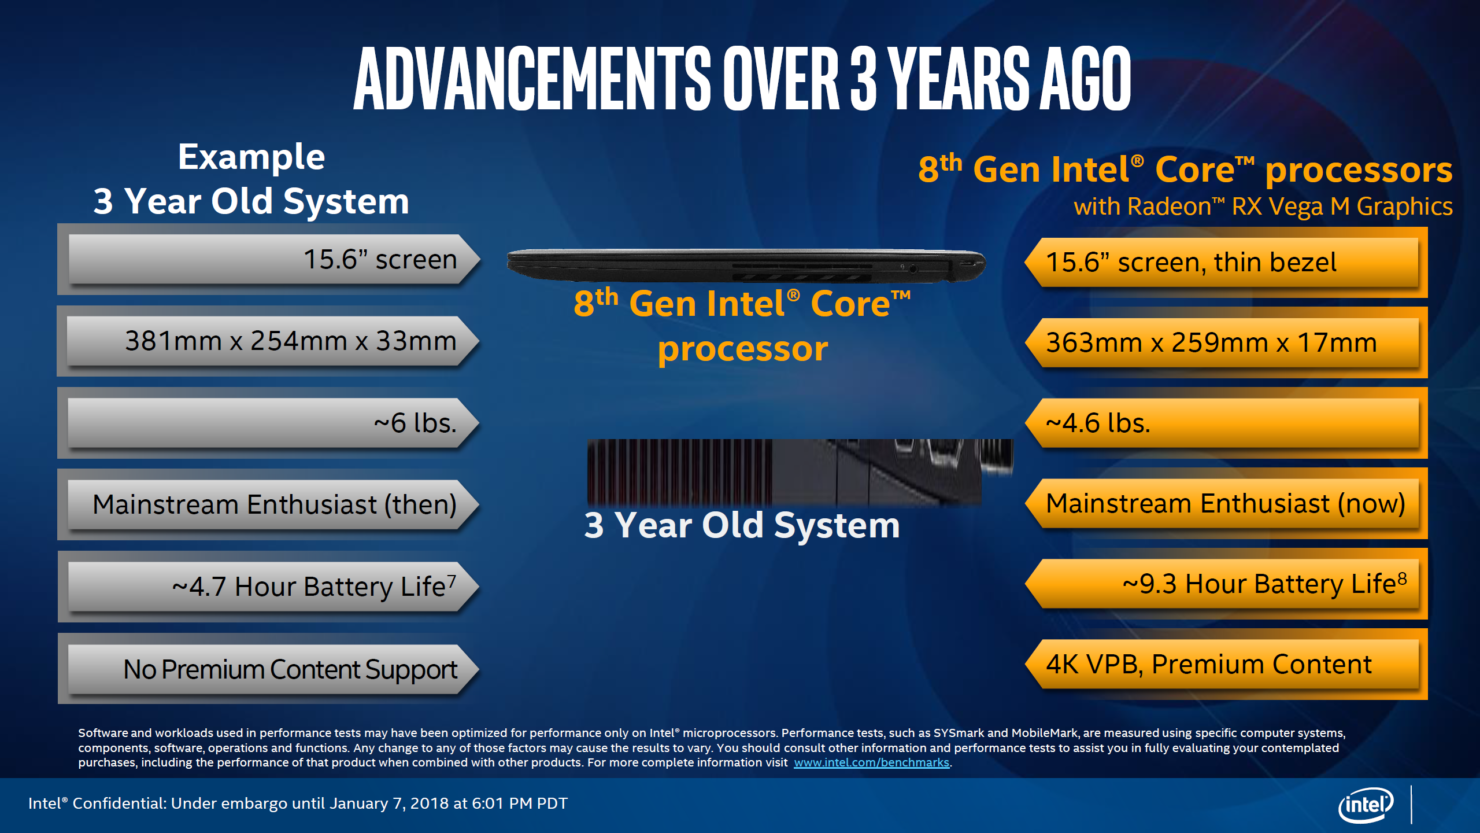 intel-8th-generation-core-processors-with-amd-radeon-rx-vega-m-graphics_13